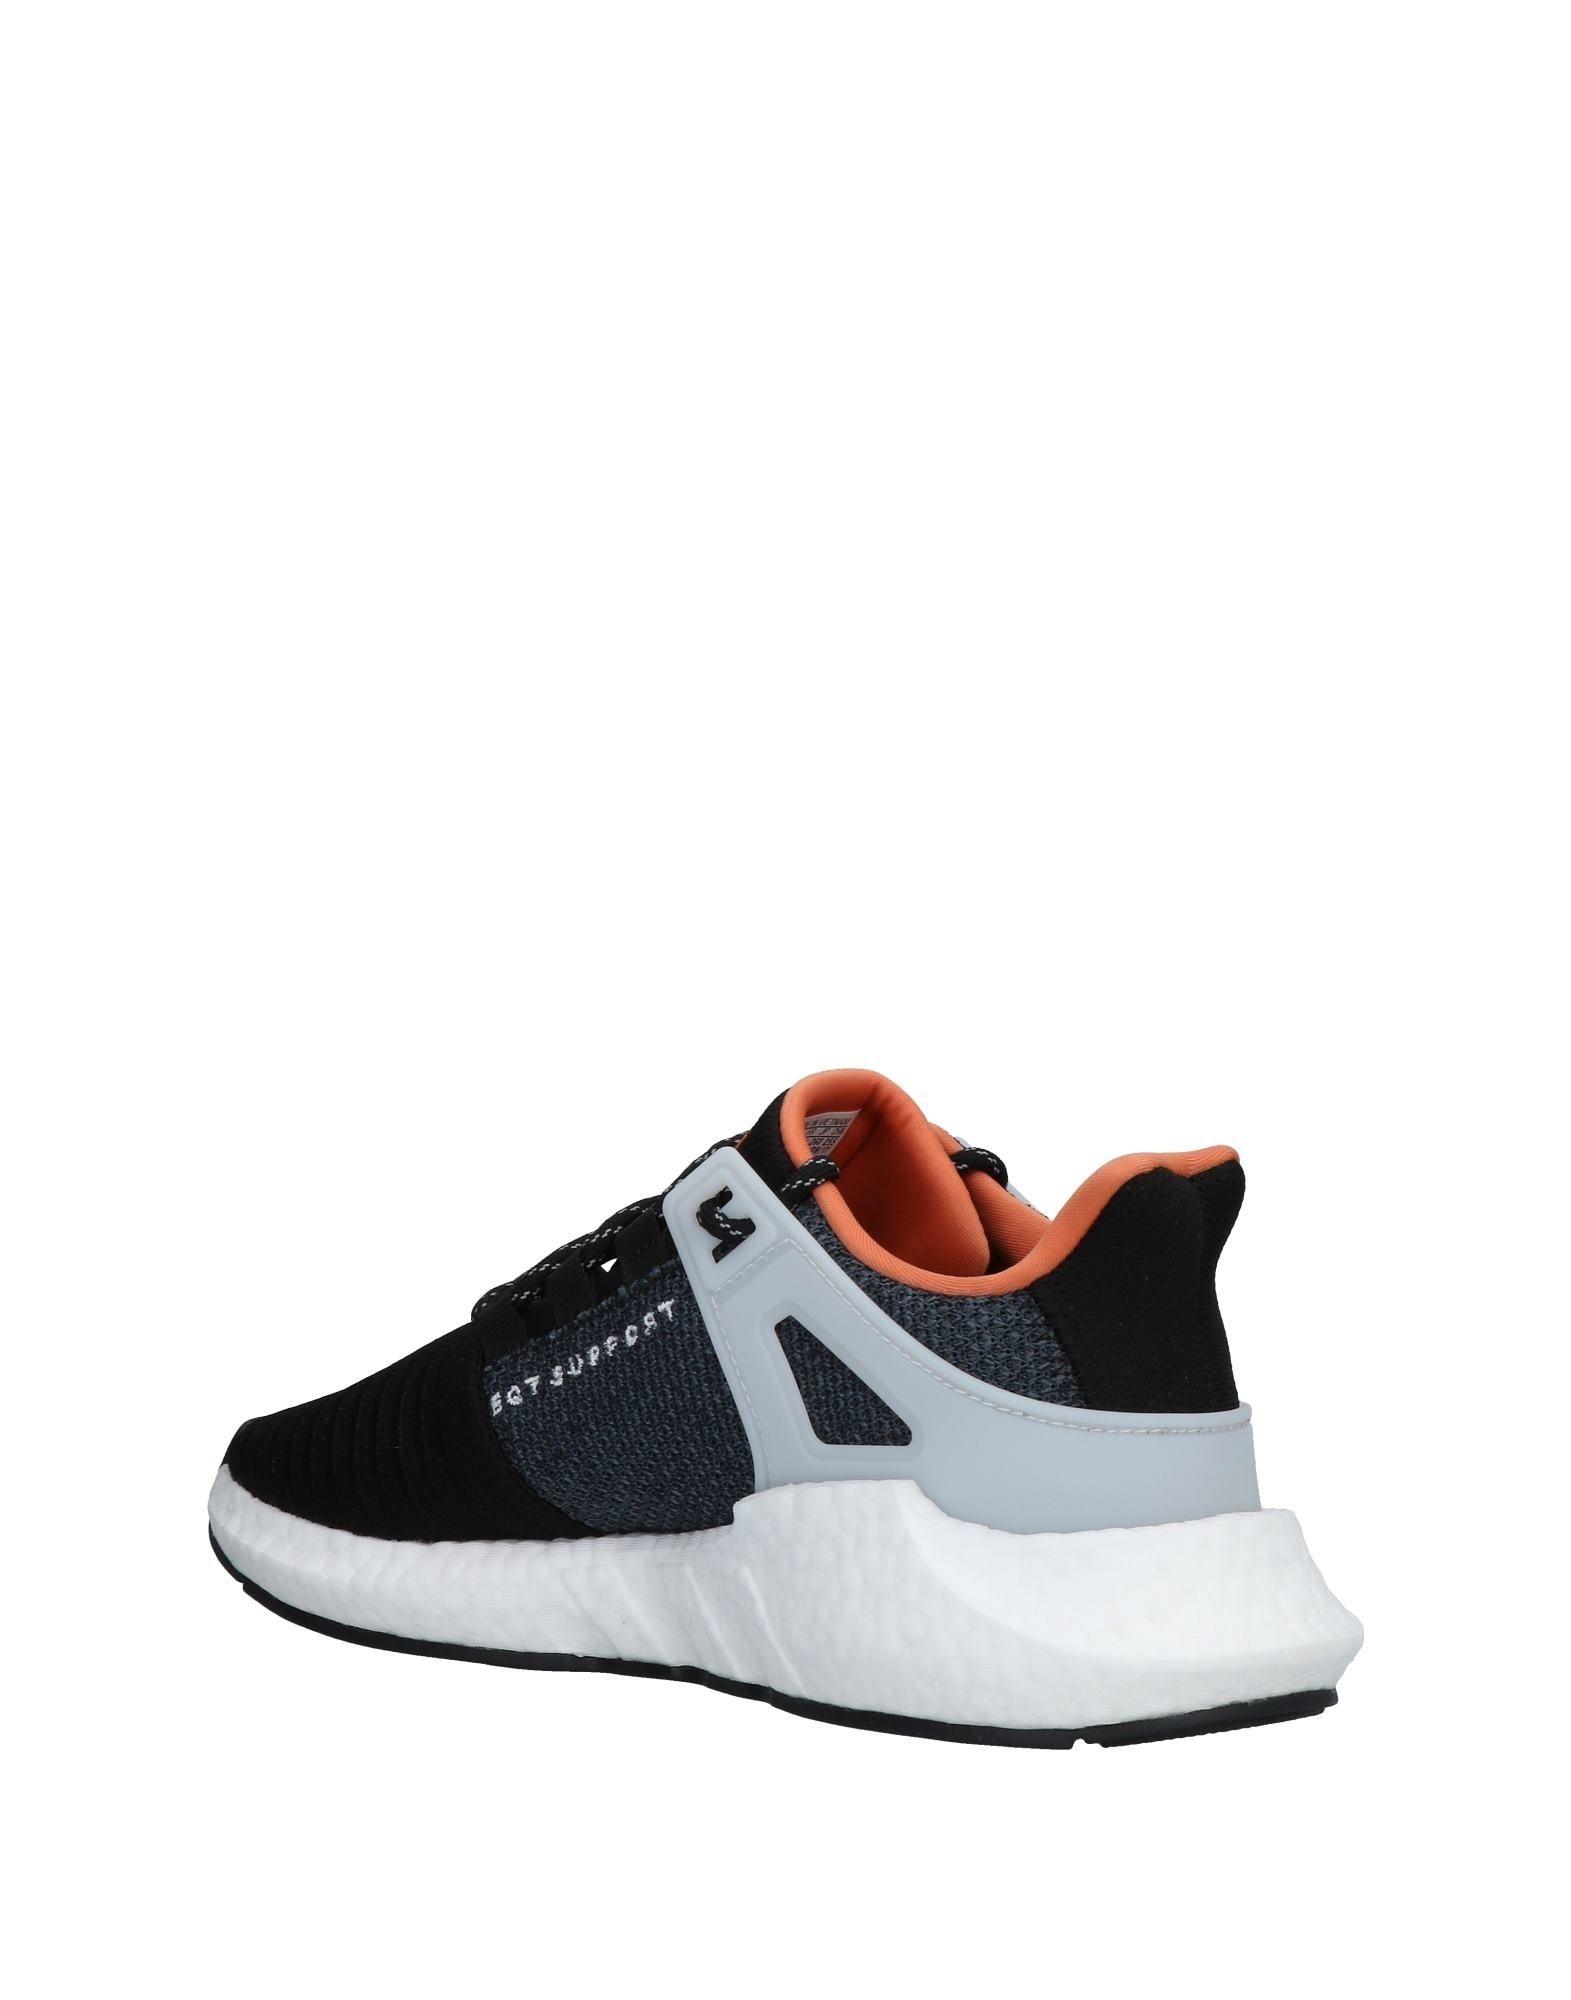 adidas adidas adidas originaux baskets - hommes adidas originaux des baskets en ligne le royaume - uni - 11466100xg 02e6cb